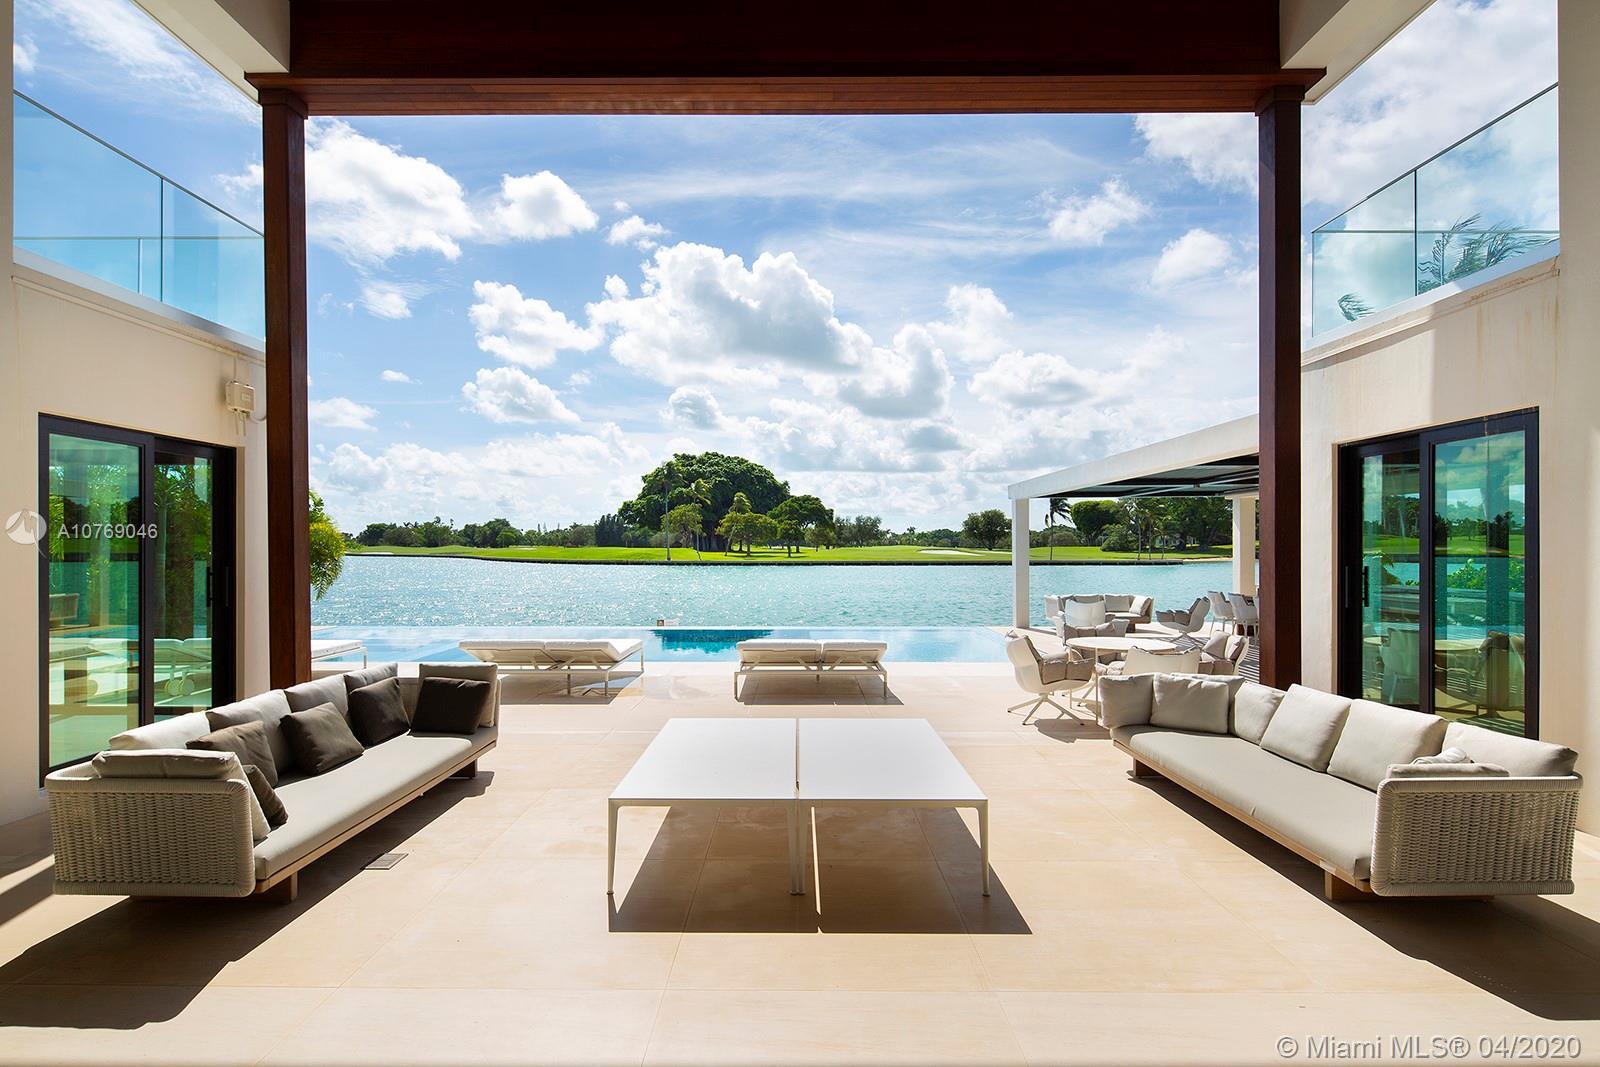 9420 W BROADVIEW DR, Bay Harbor Islands, FL 33154 - Bay Harbor Islands, FL real estate listing